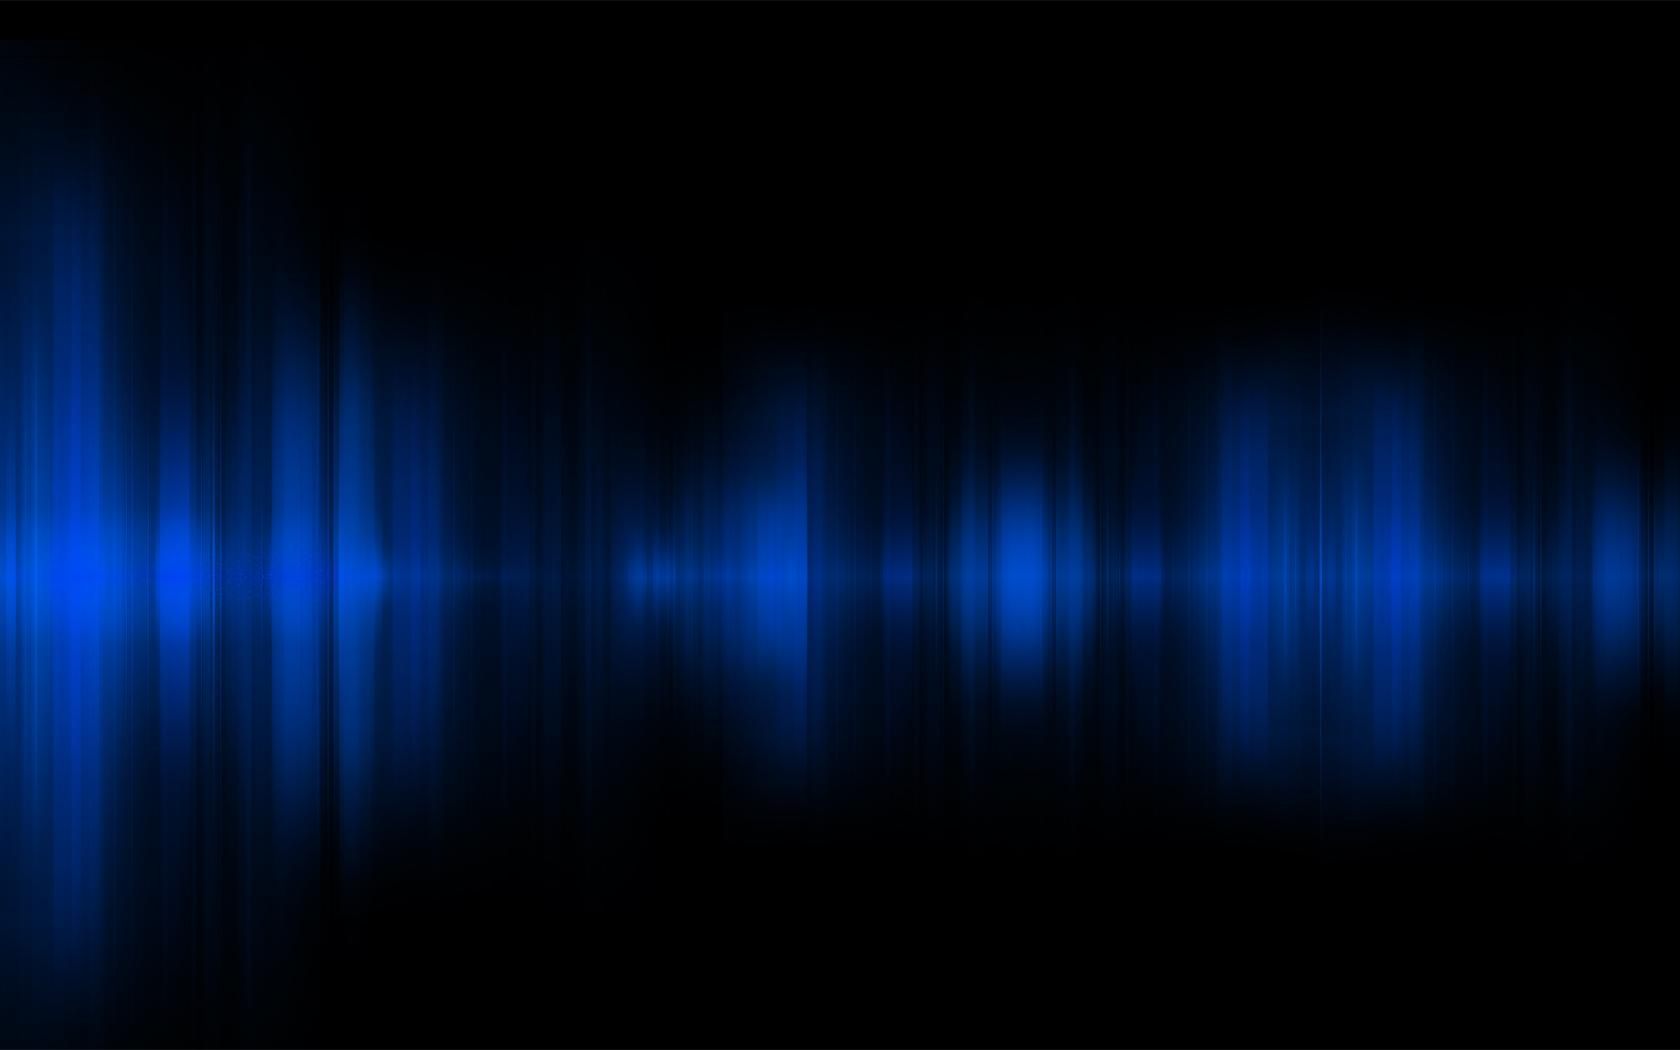 Download Abstract Blue Digital Art Black Background Wallpaper Full 1680x1050